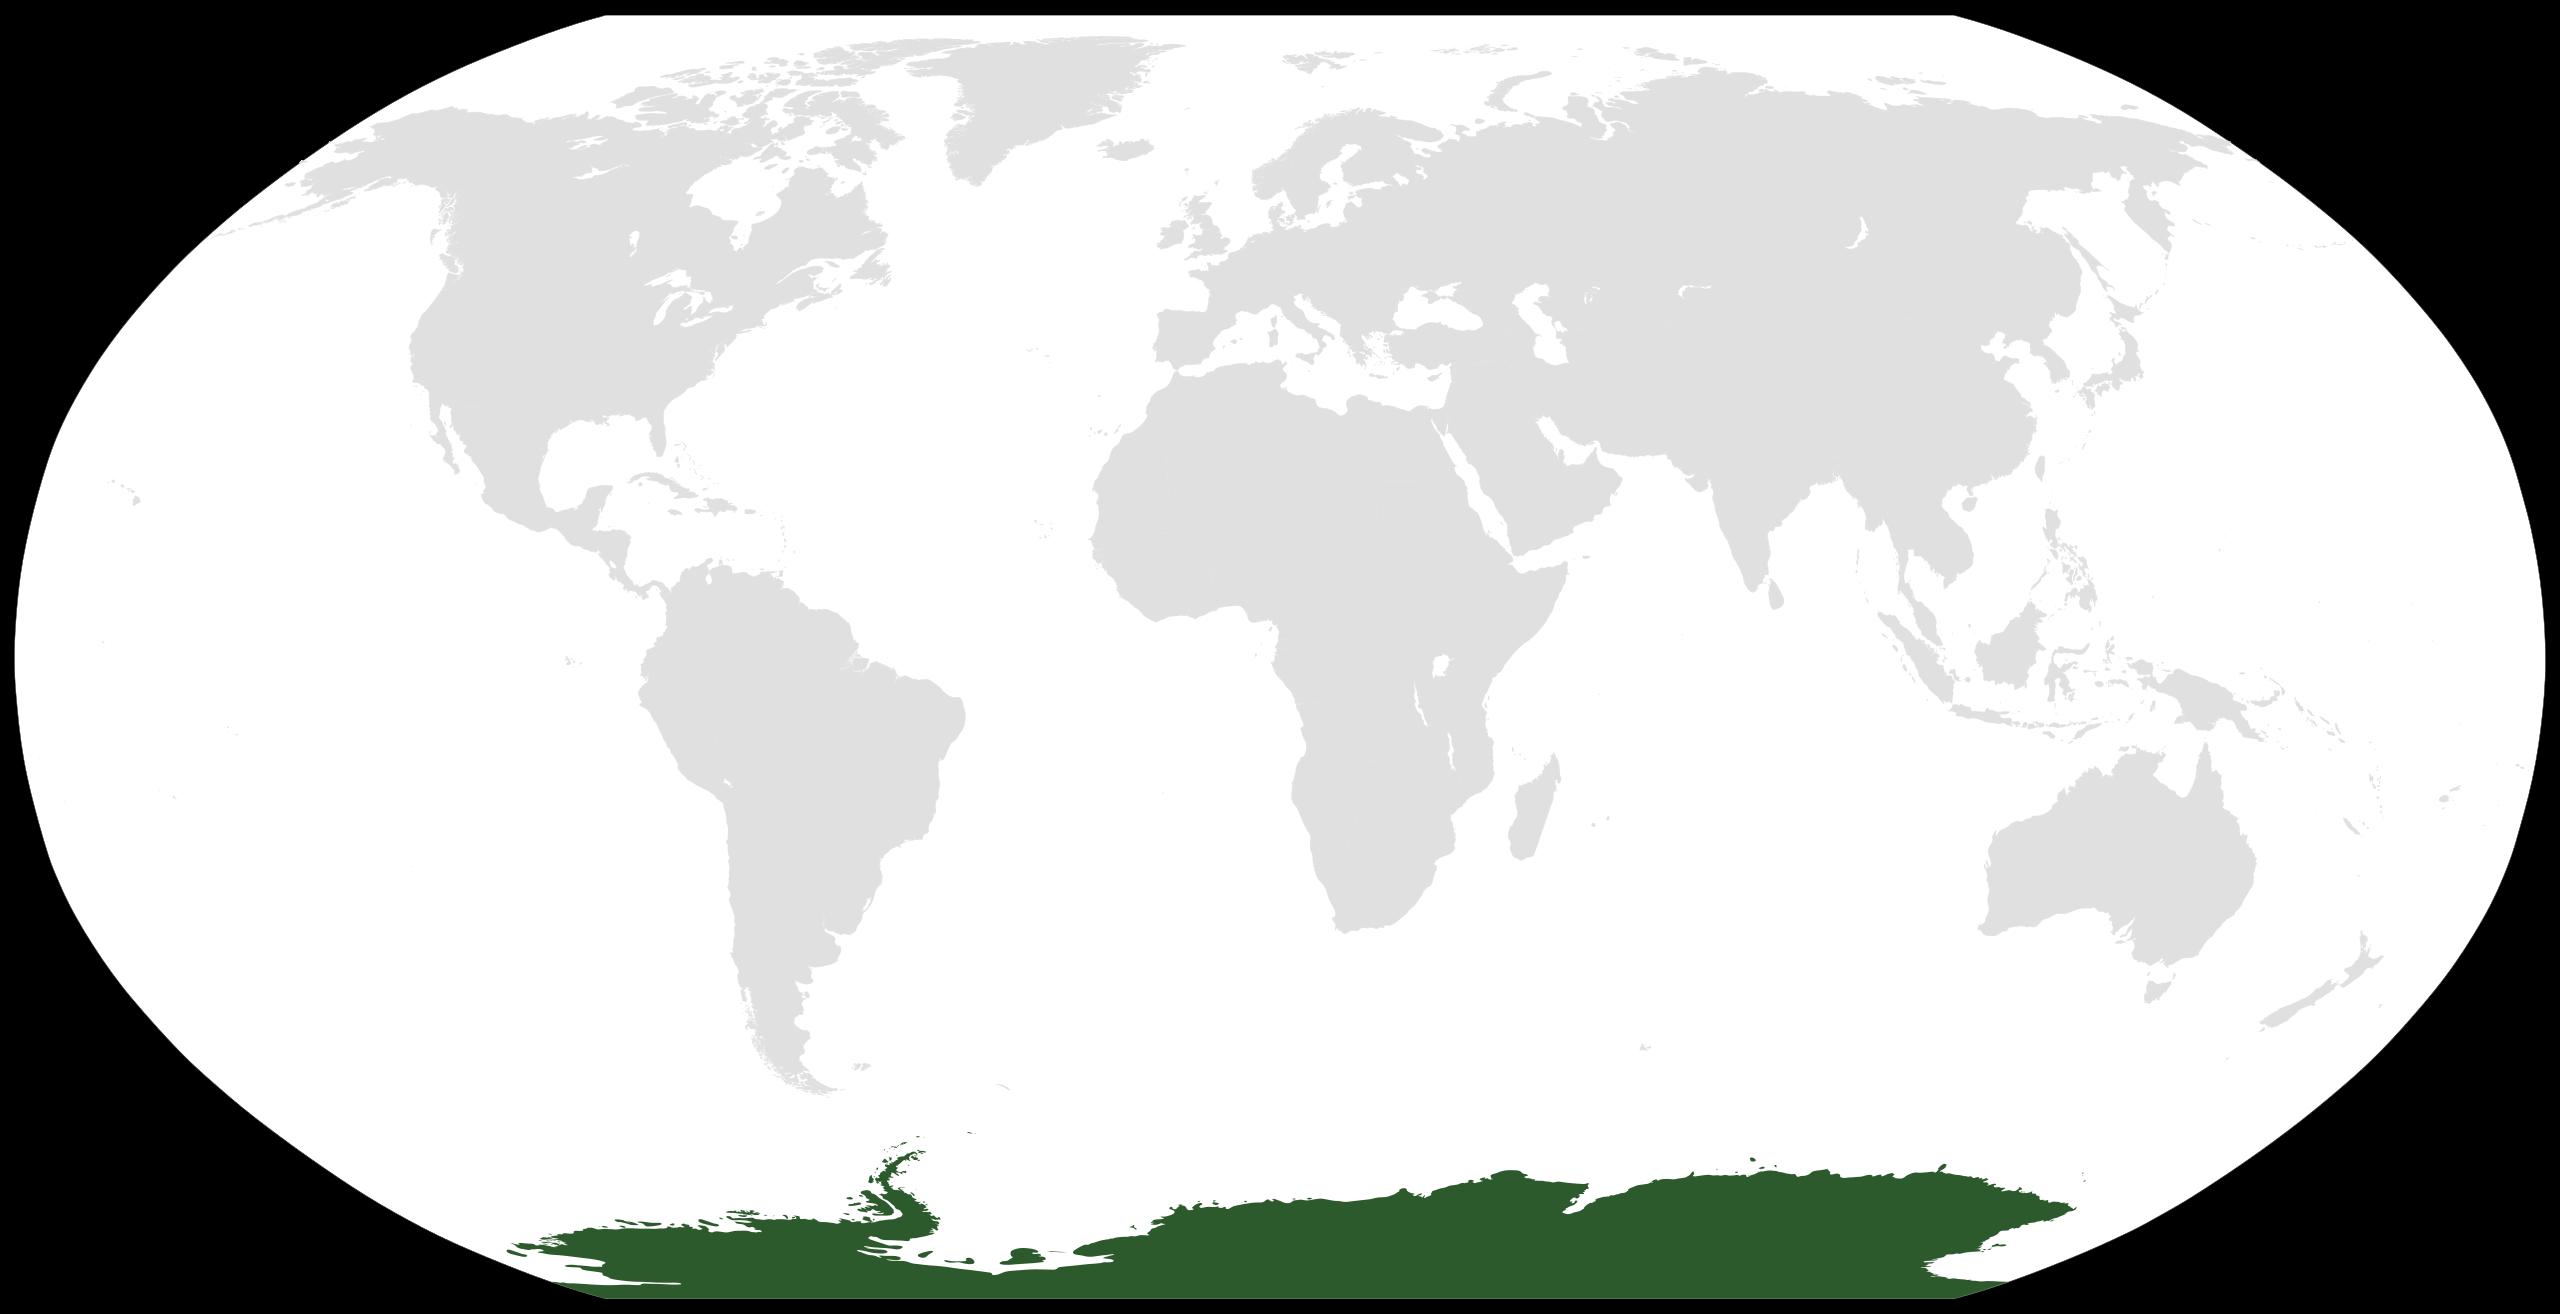 Location clipart absolute location. File antarctica svg wikimedia